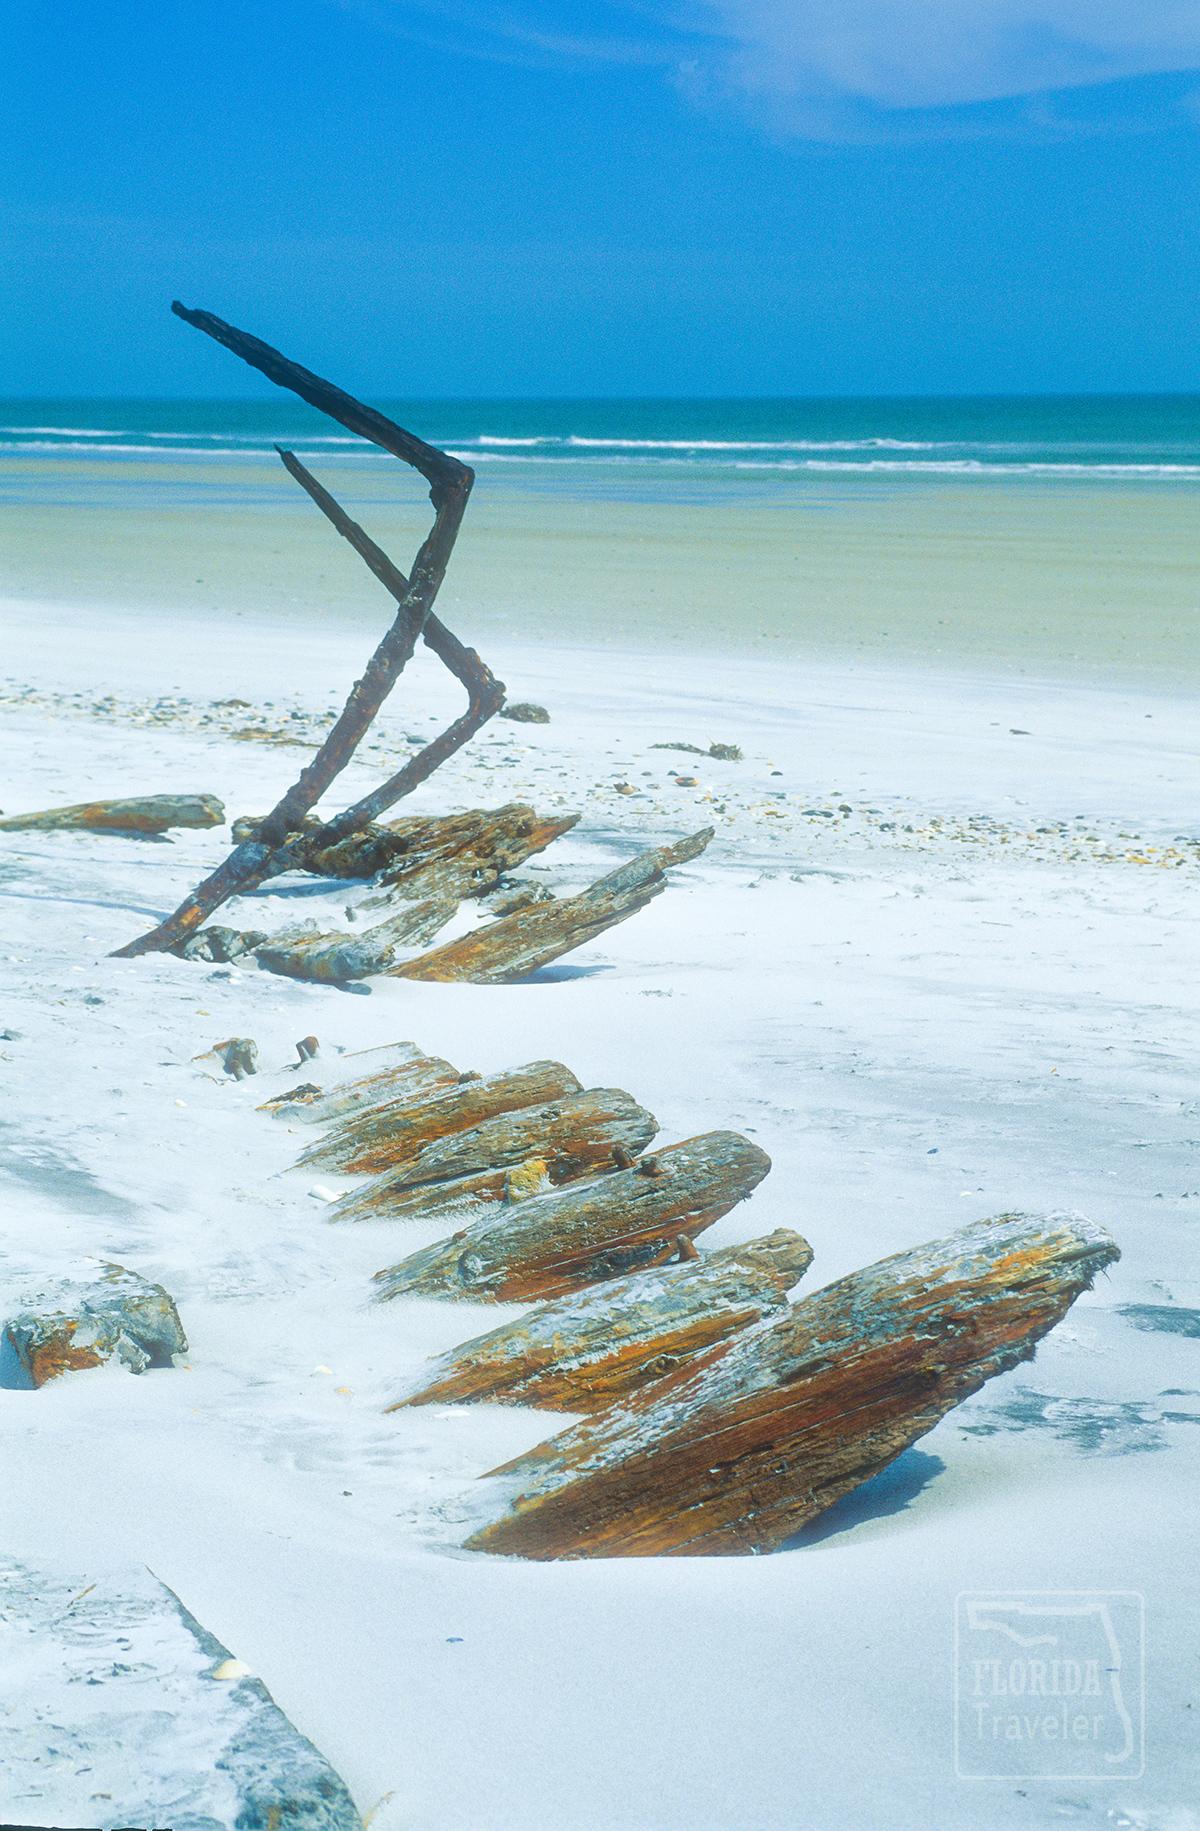 Talbot Island Shipwreck